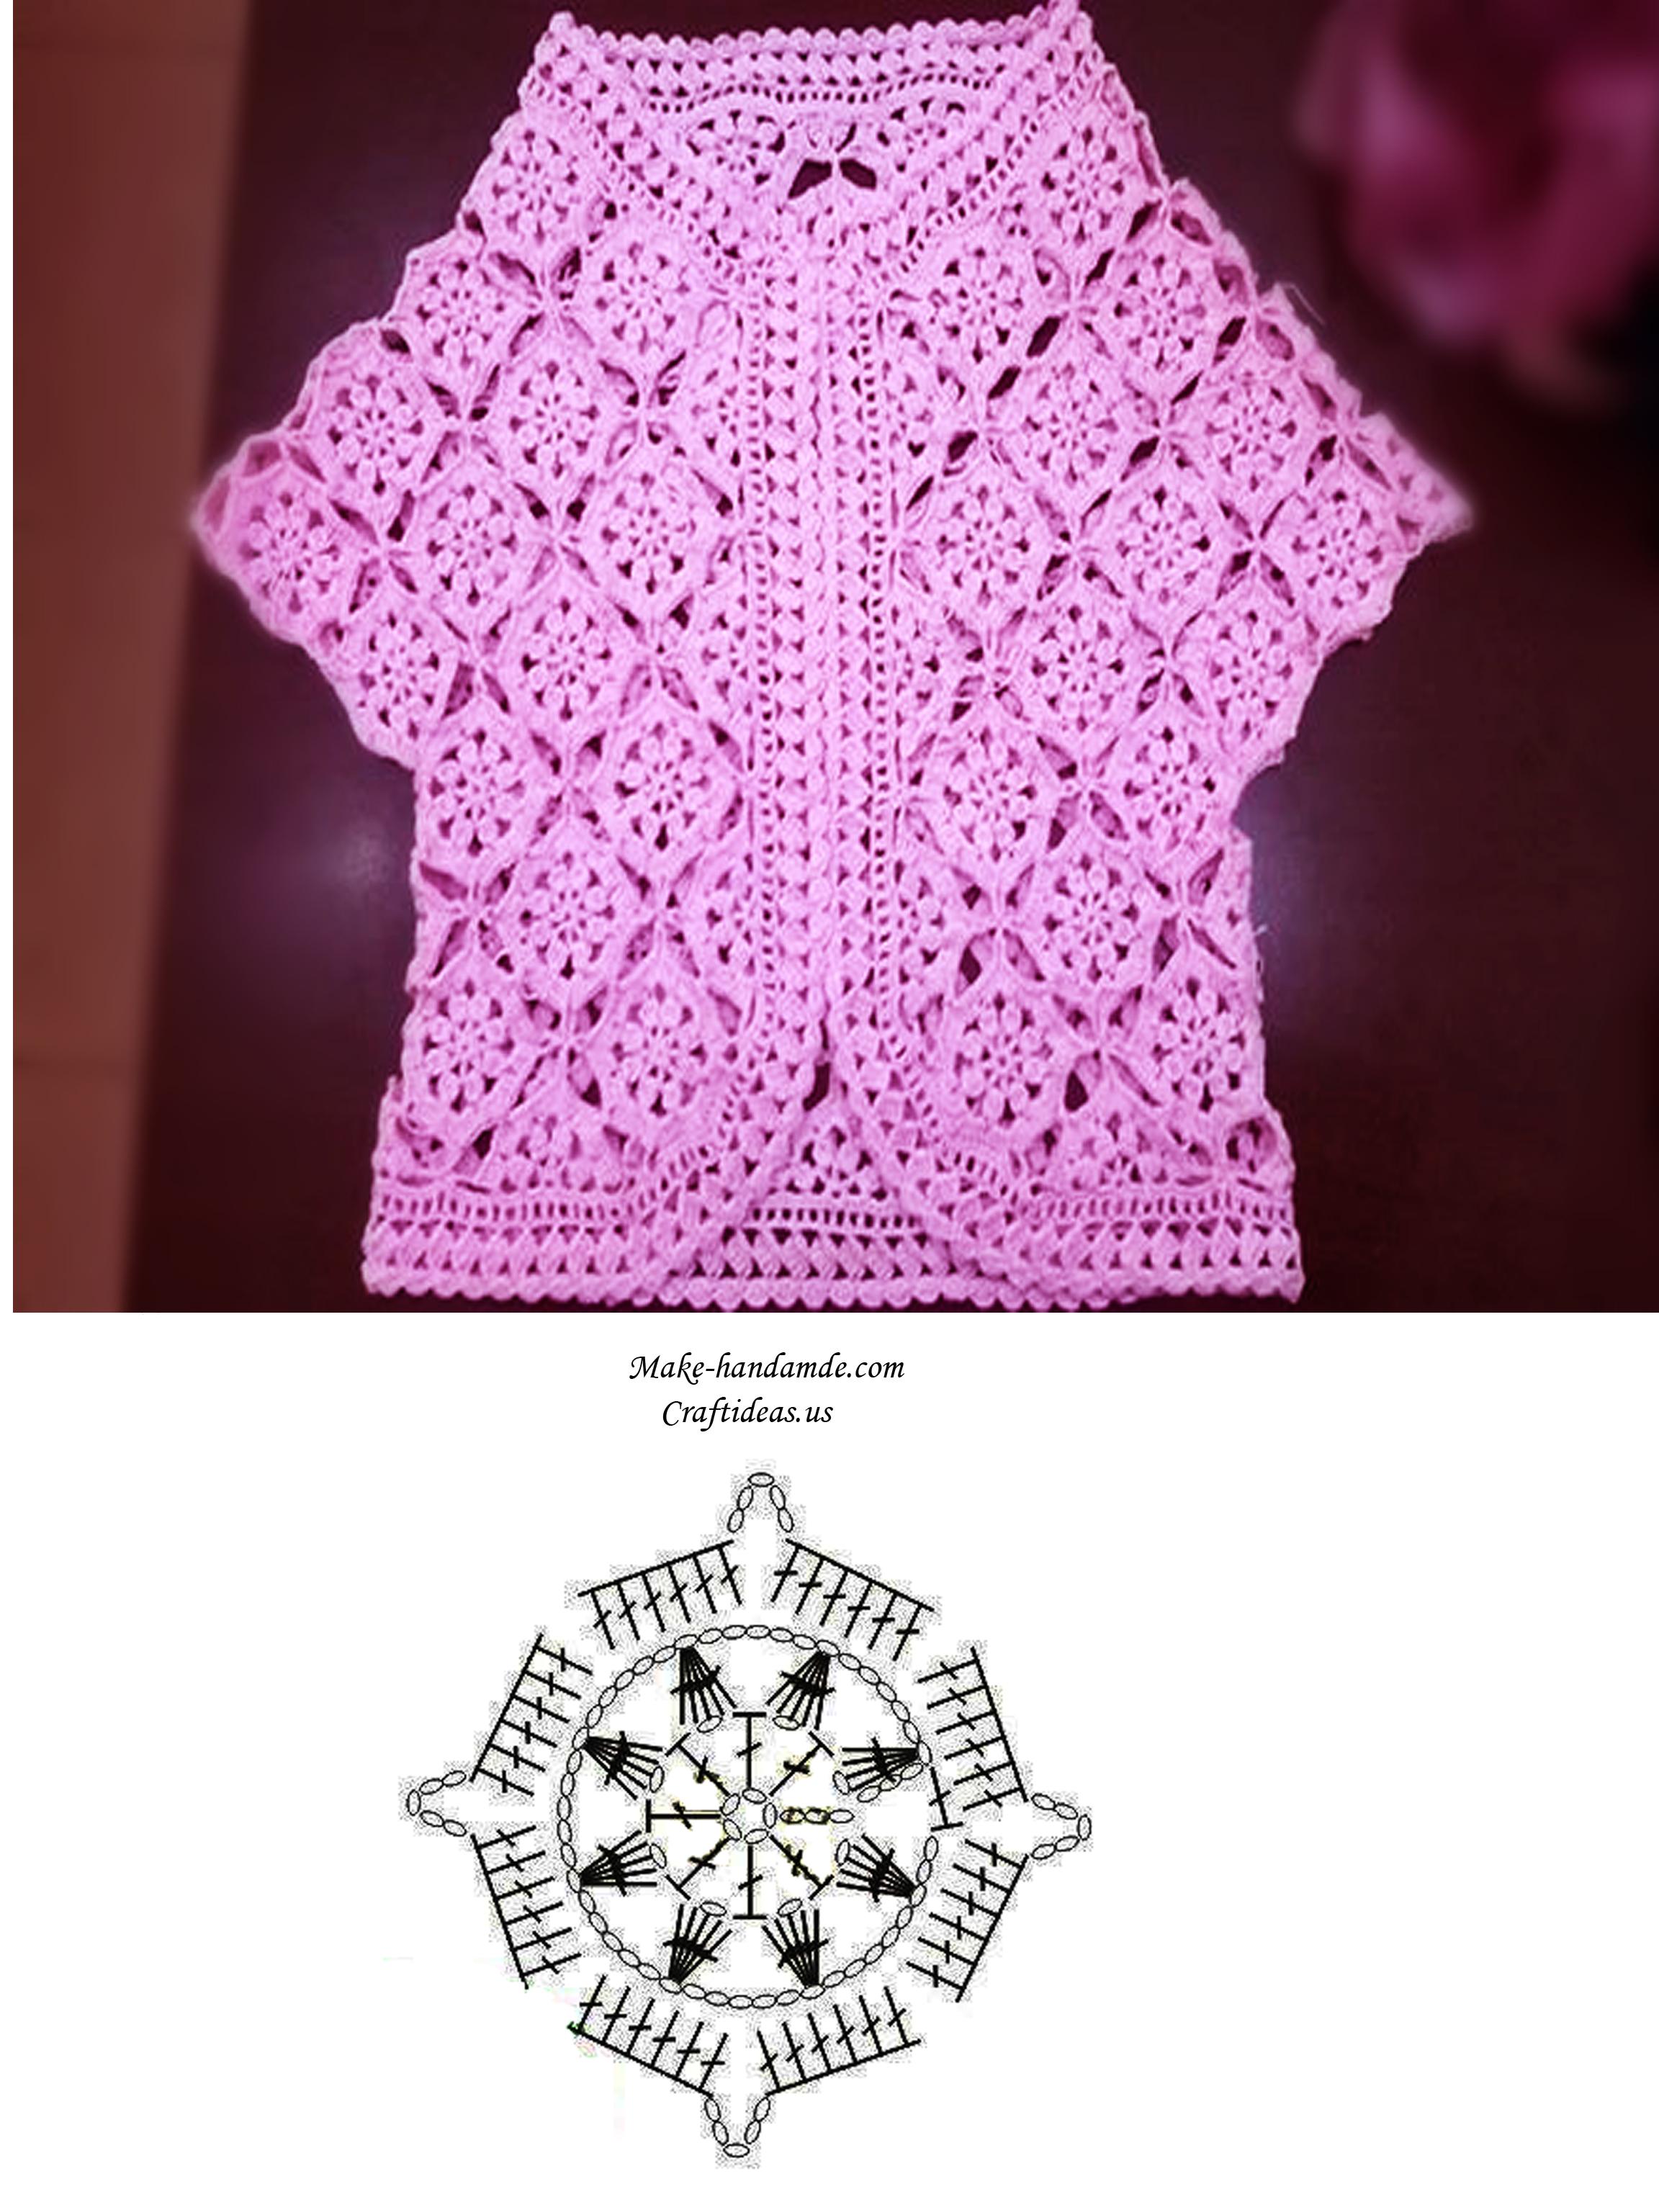 Crochet Flower Lace Vest Girl Craft Ideas